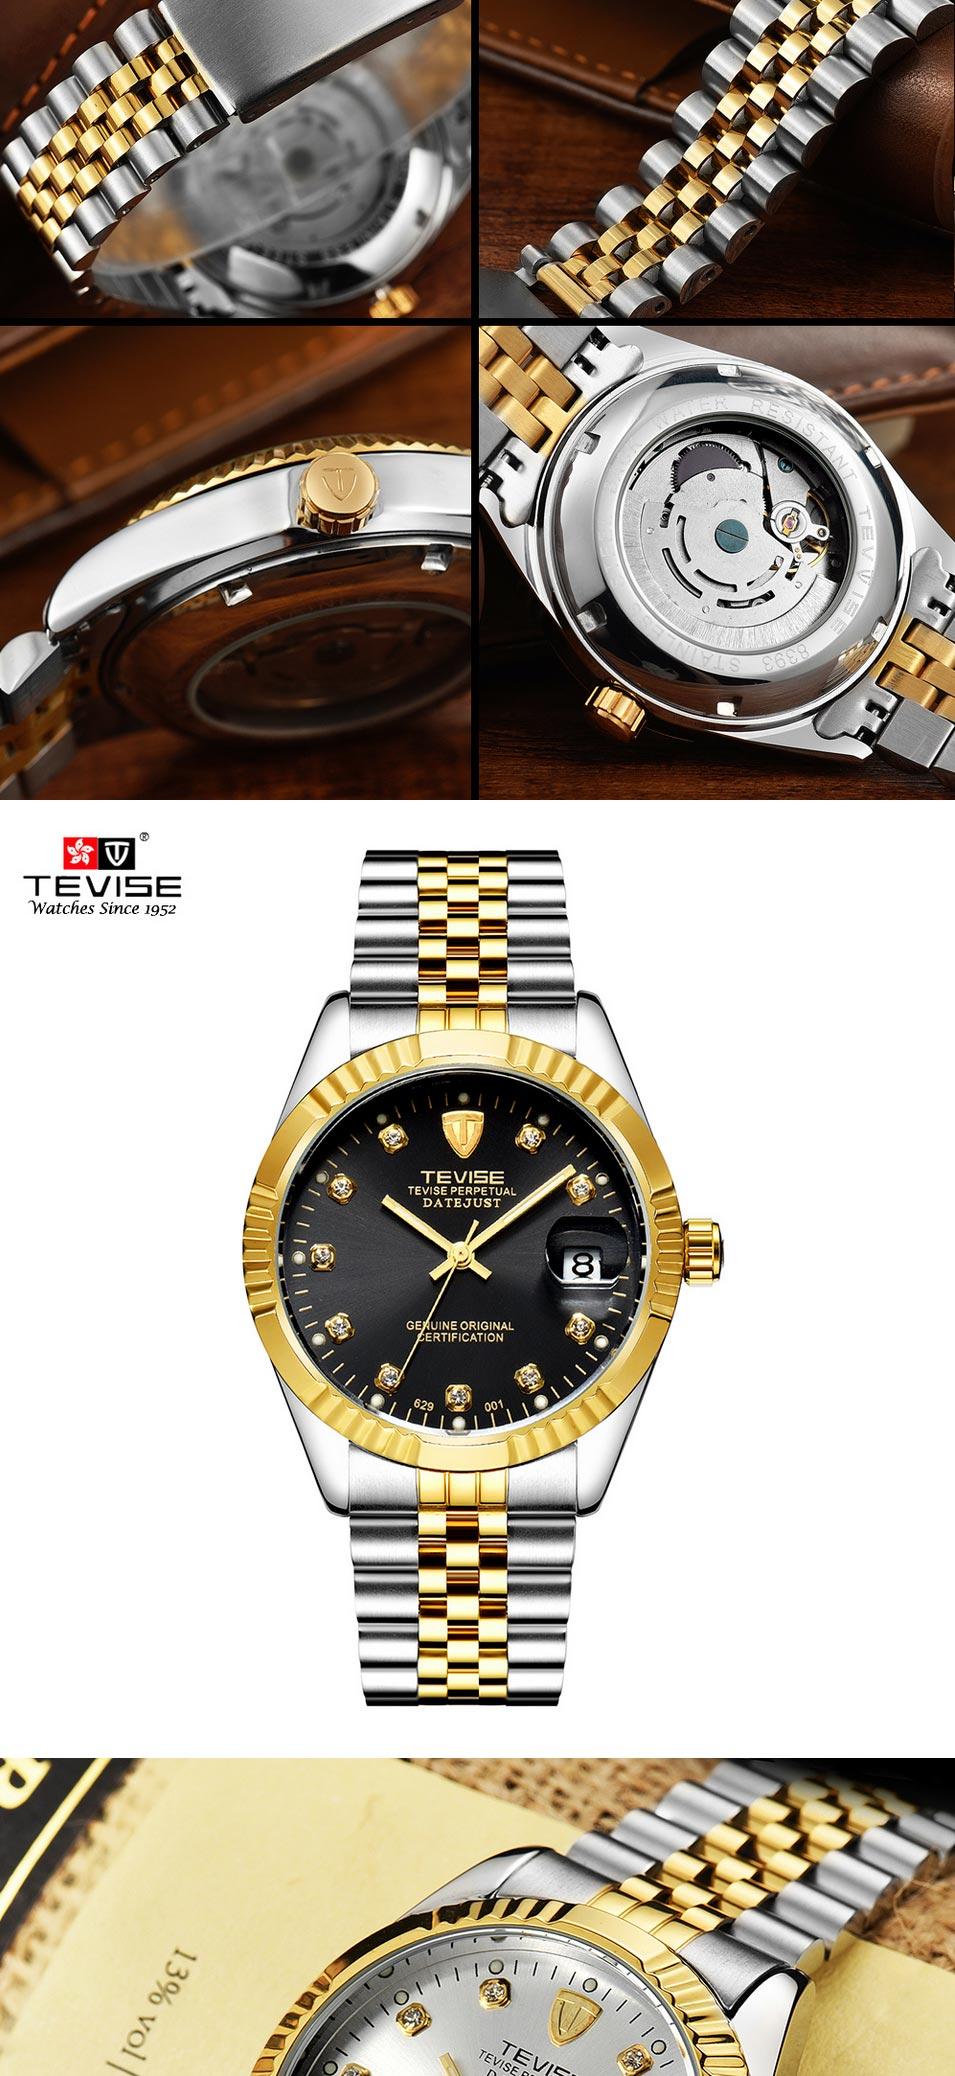 TEVISE-Men-Brand-Watch-F-02